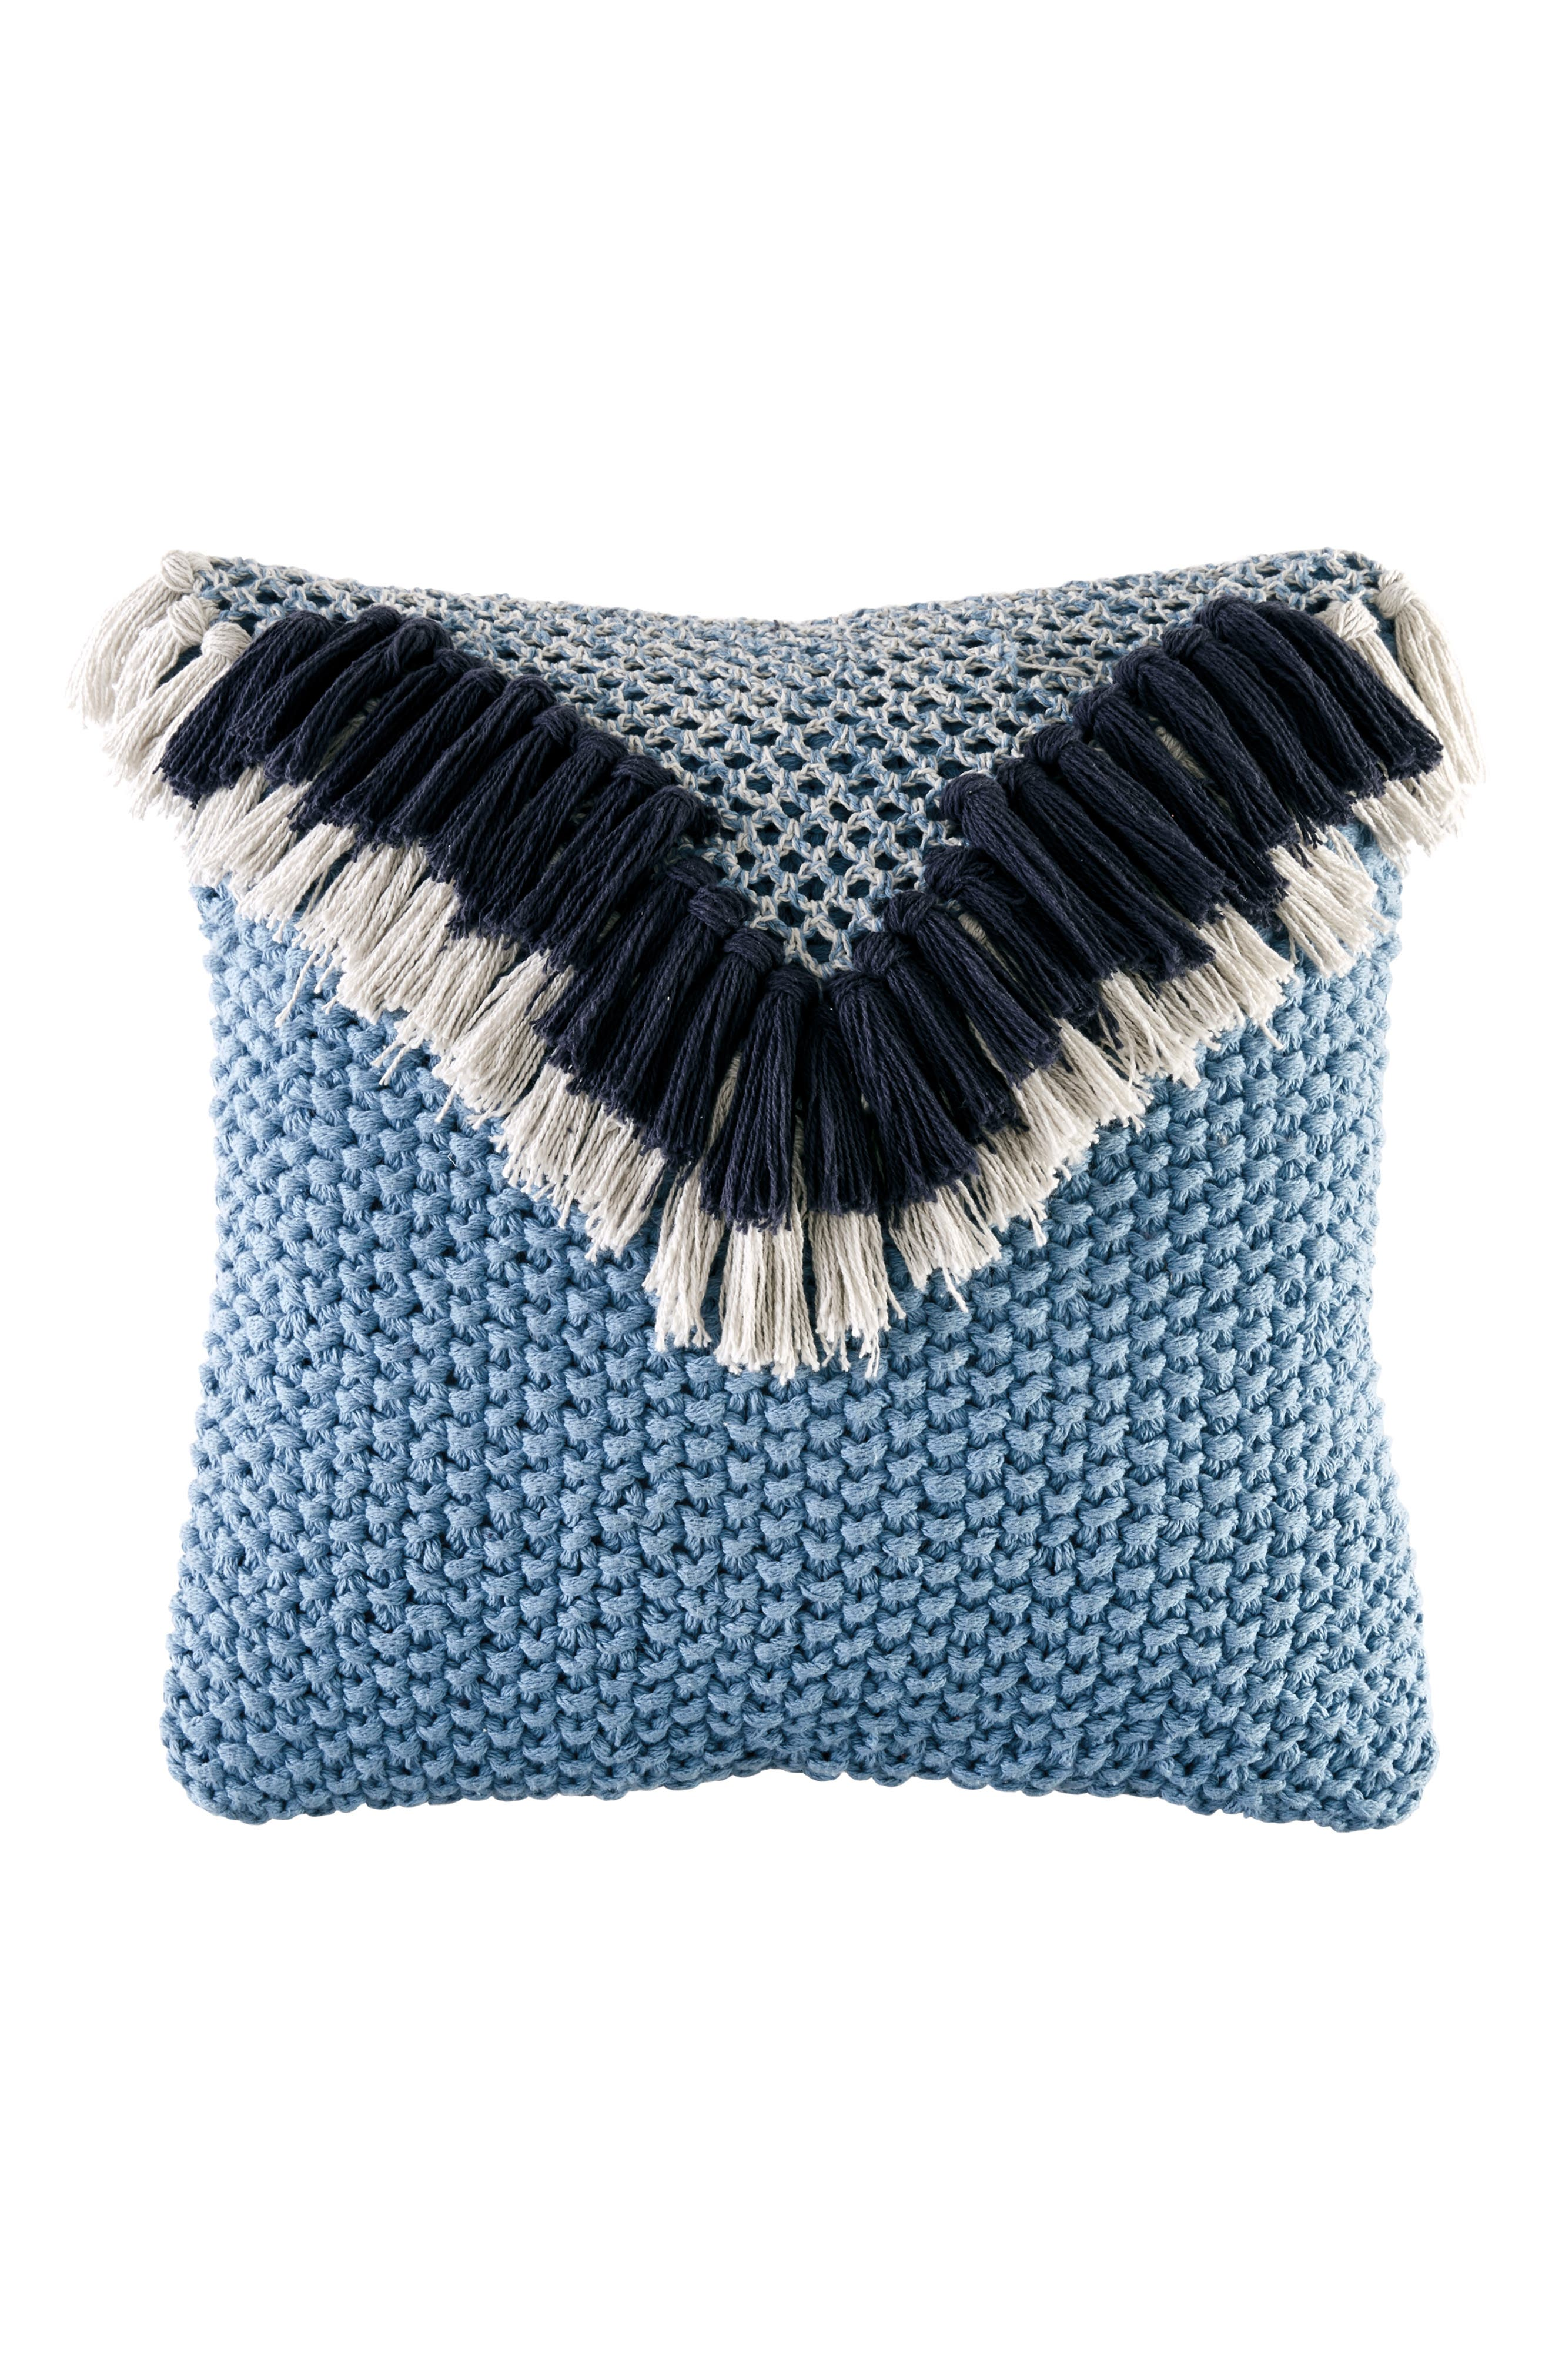 Alternate Image 1 Selected - BCBGeneration Fringe Knit Accent Pillow